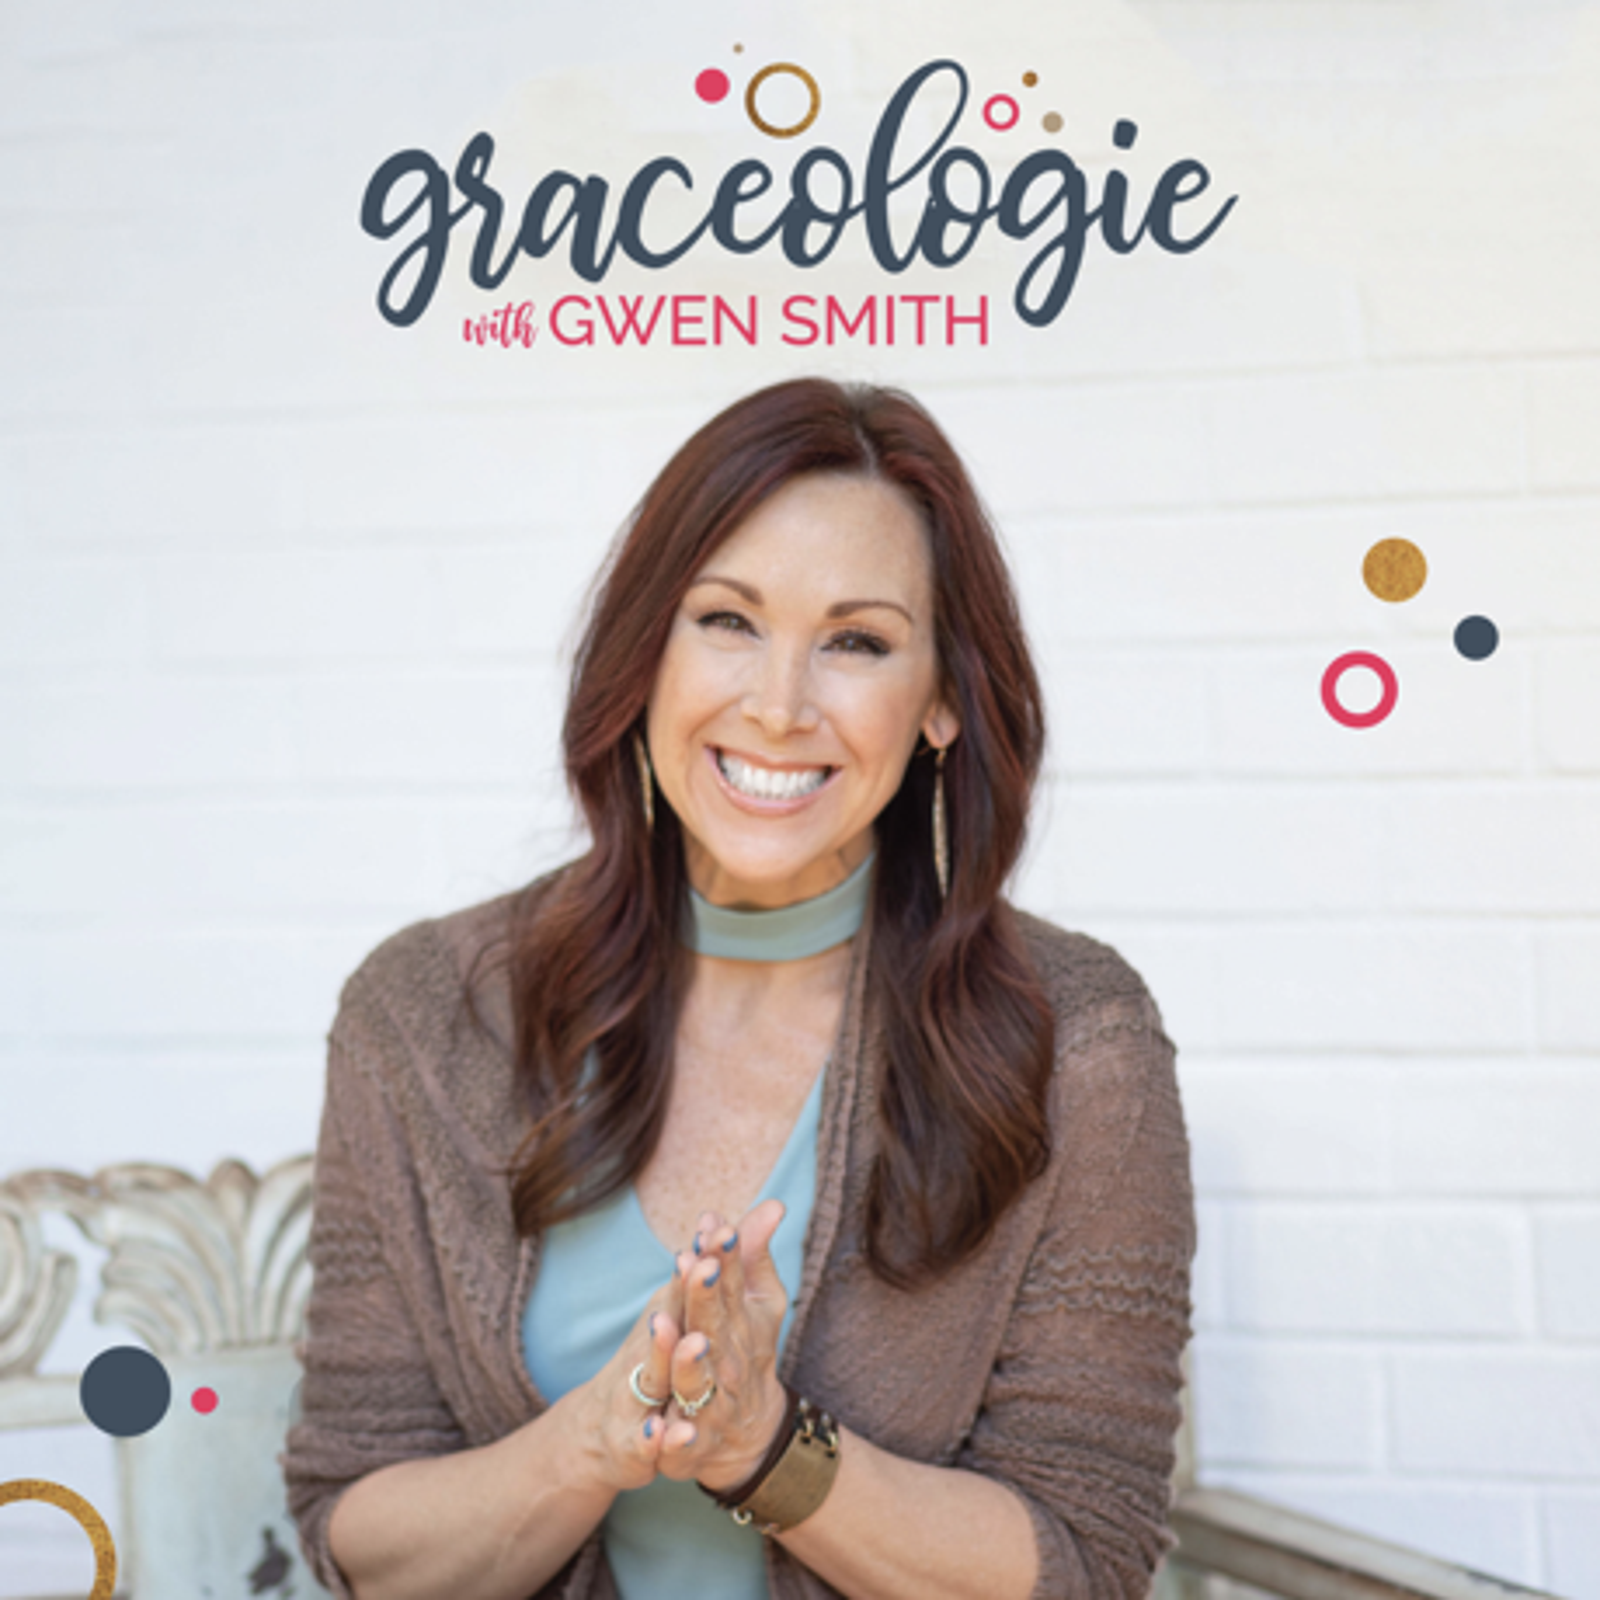 GIG-graceology-girlfriends in god